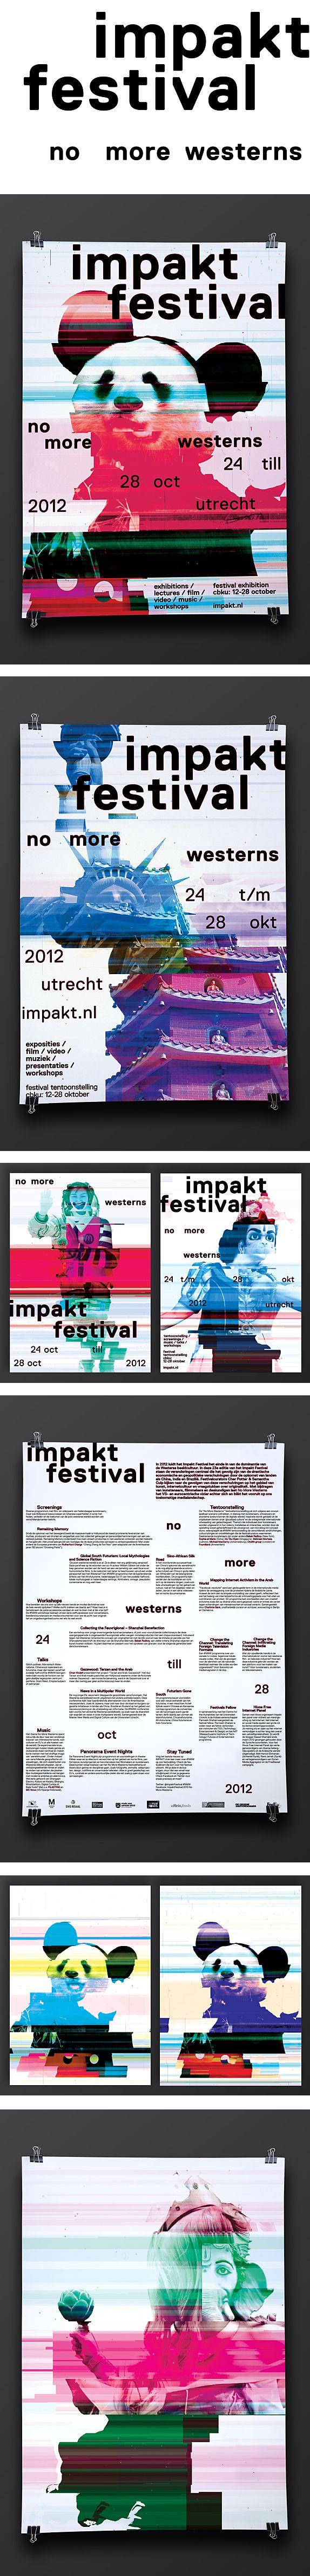 Corporate Design, ID, Logo, Poster, Print, Impakt Festival 2012, by Lava Graphic…